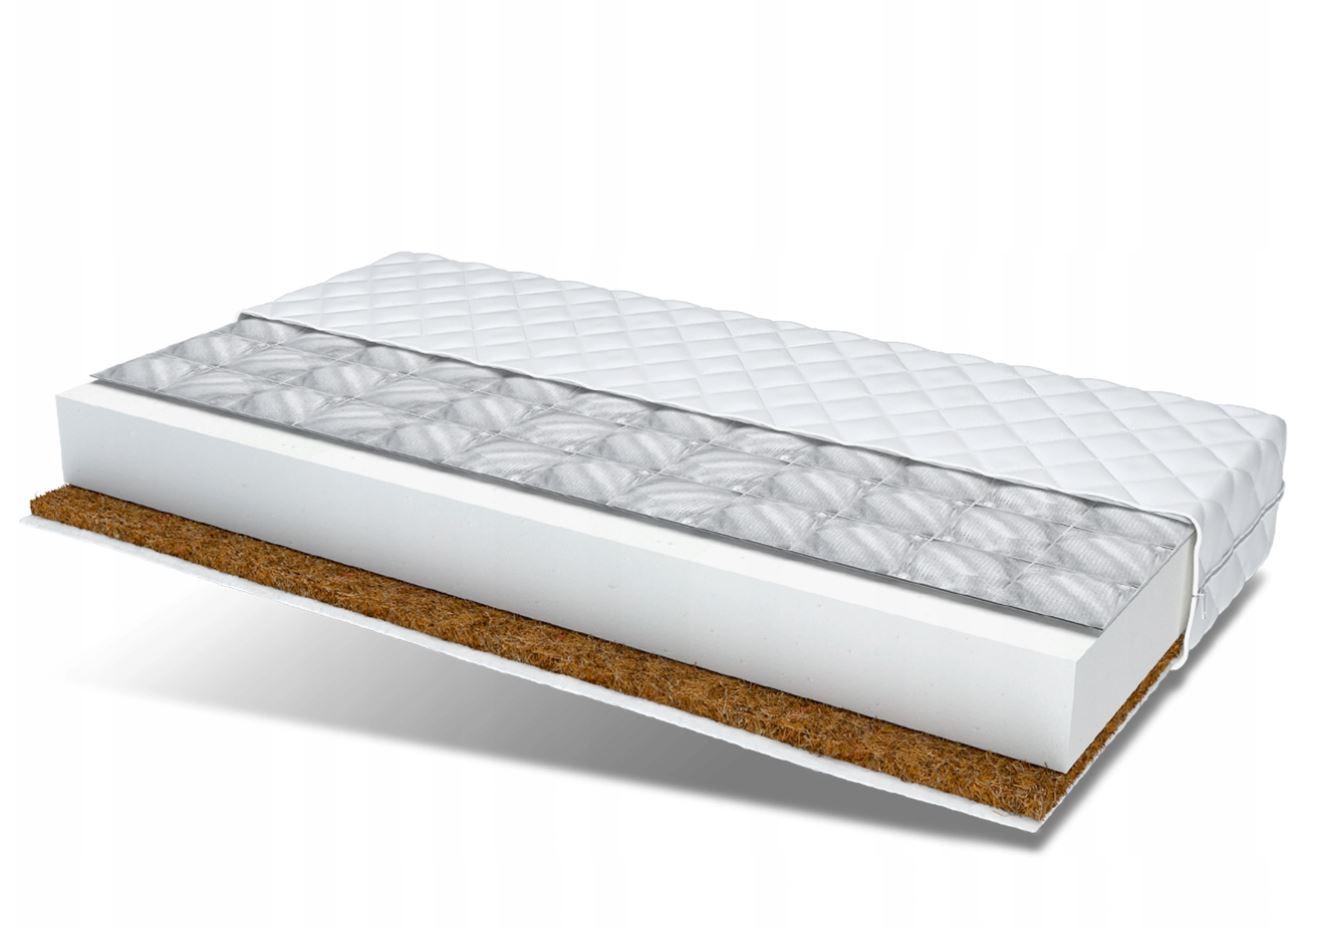 Dětská matrace Classic pohanka-kokos 160x80x9 cm